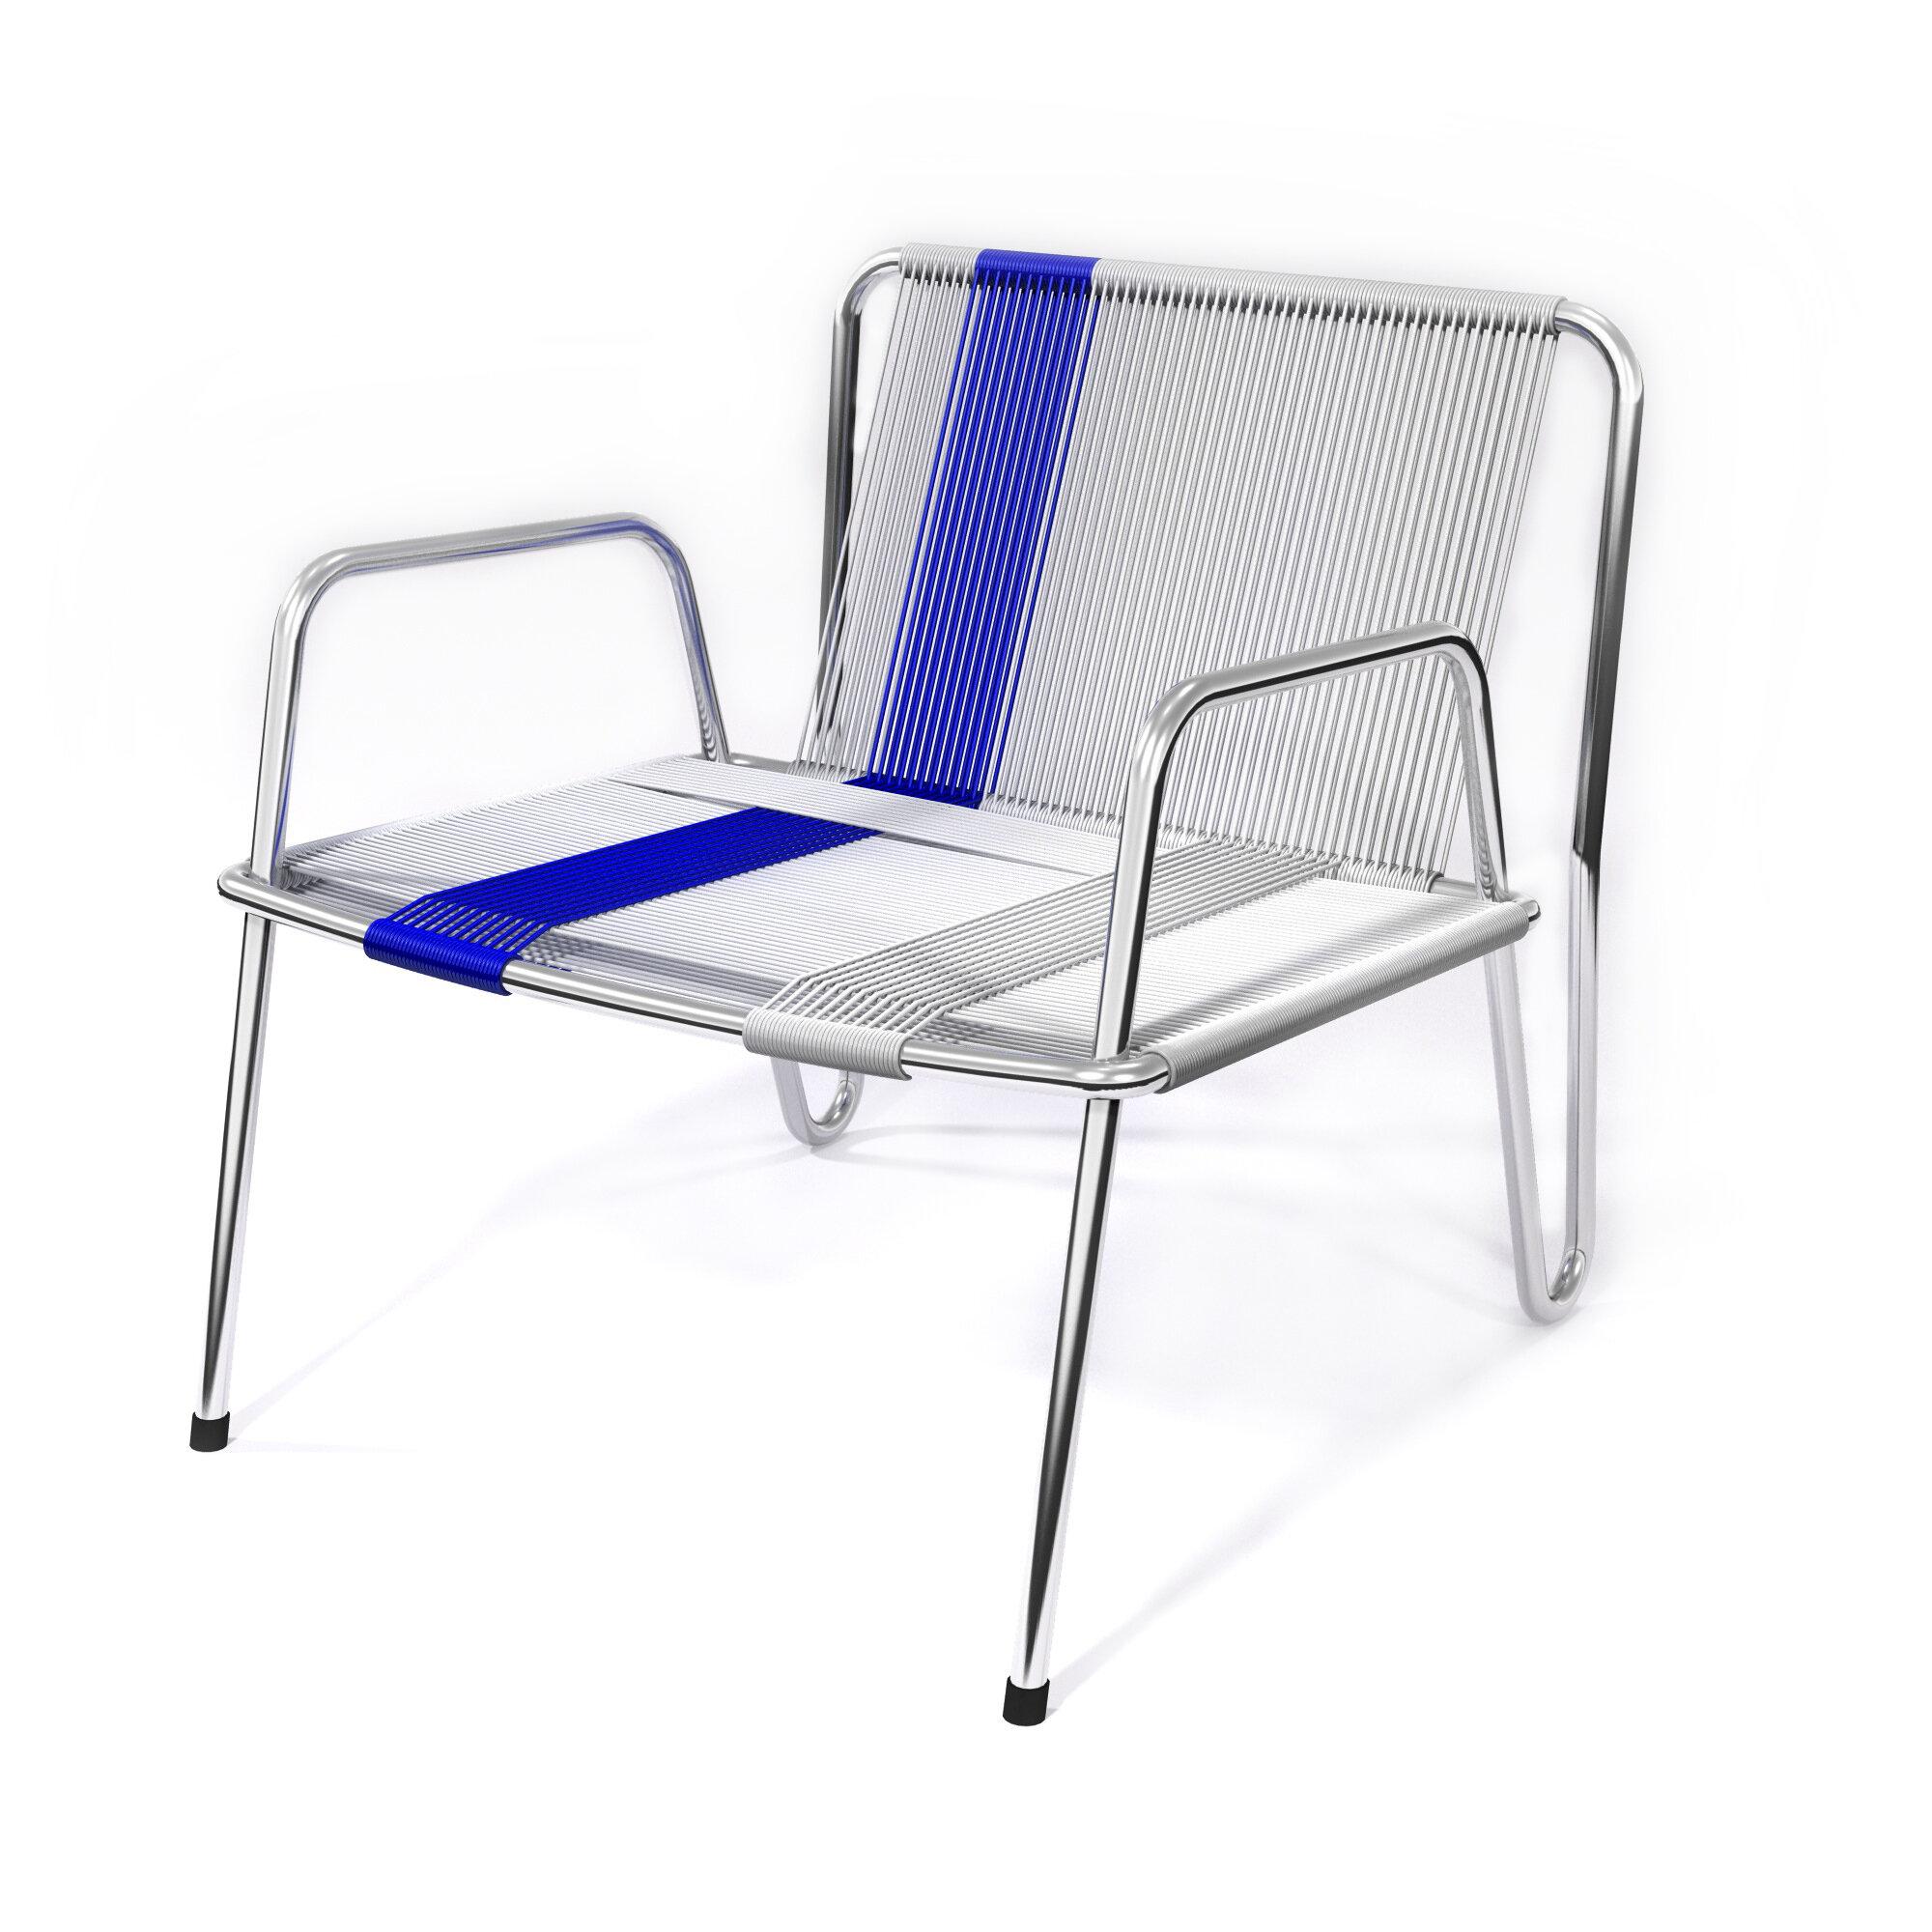 sleeper new minimalist set pvc of best loveseat design furniture patio simple fortable under